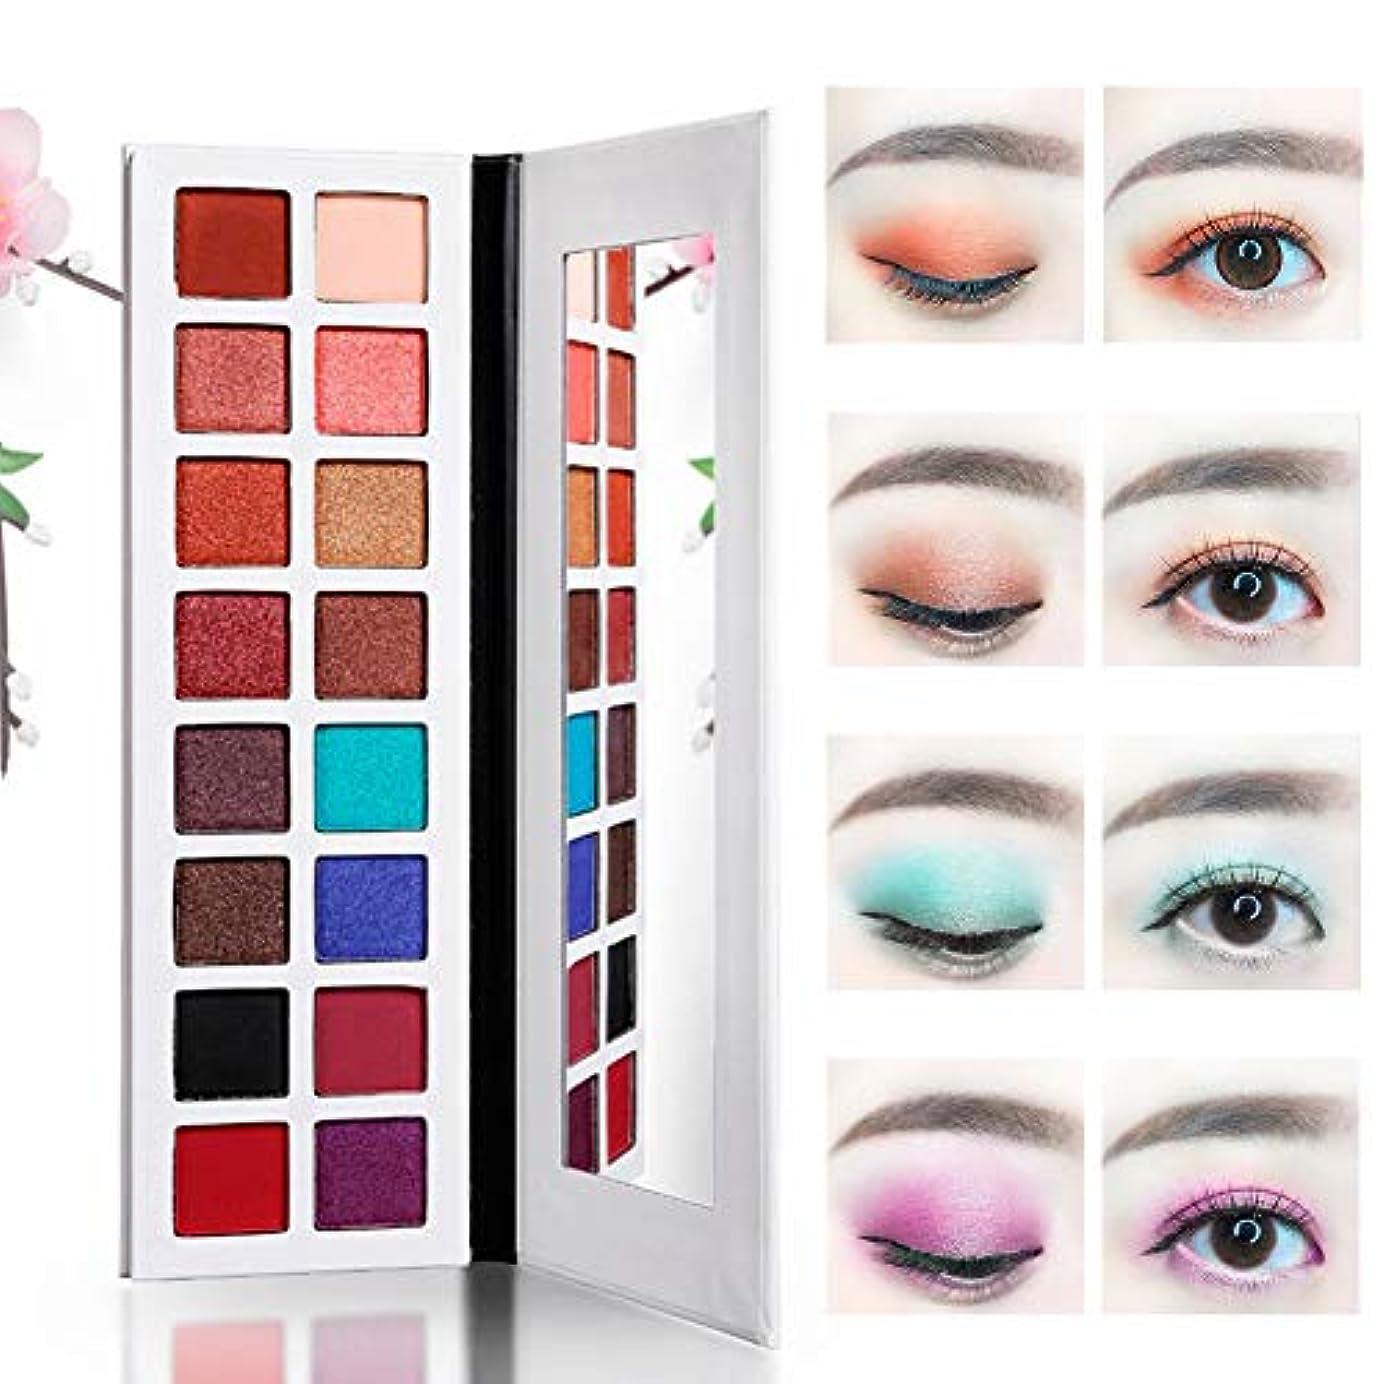 Symboat Eyeshadow 16色 アイシャドウパレット長続きファッション 化粧品 女性用 ヌードメイク自然立体 高発色 初心者アイシャドウ激安 ラメ ラメ入り